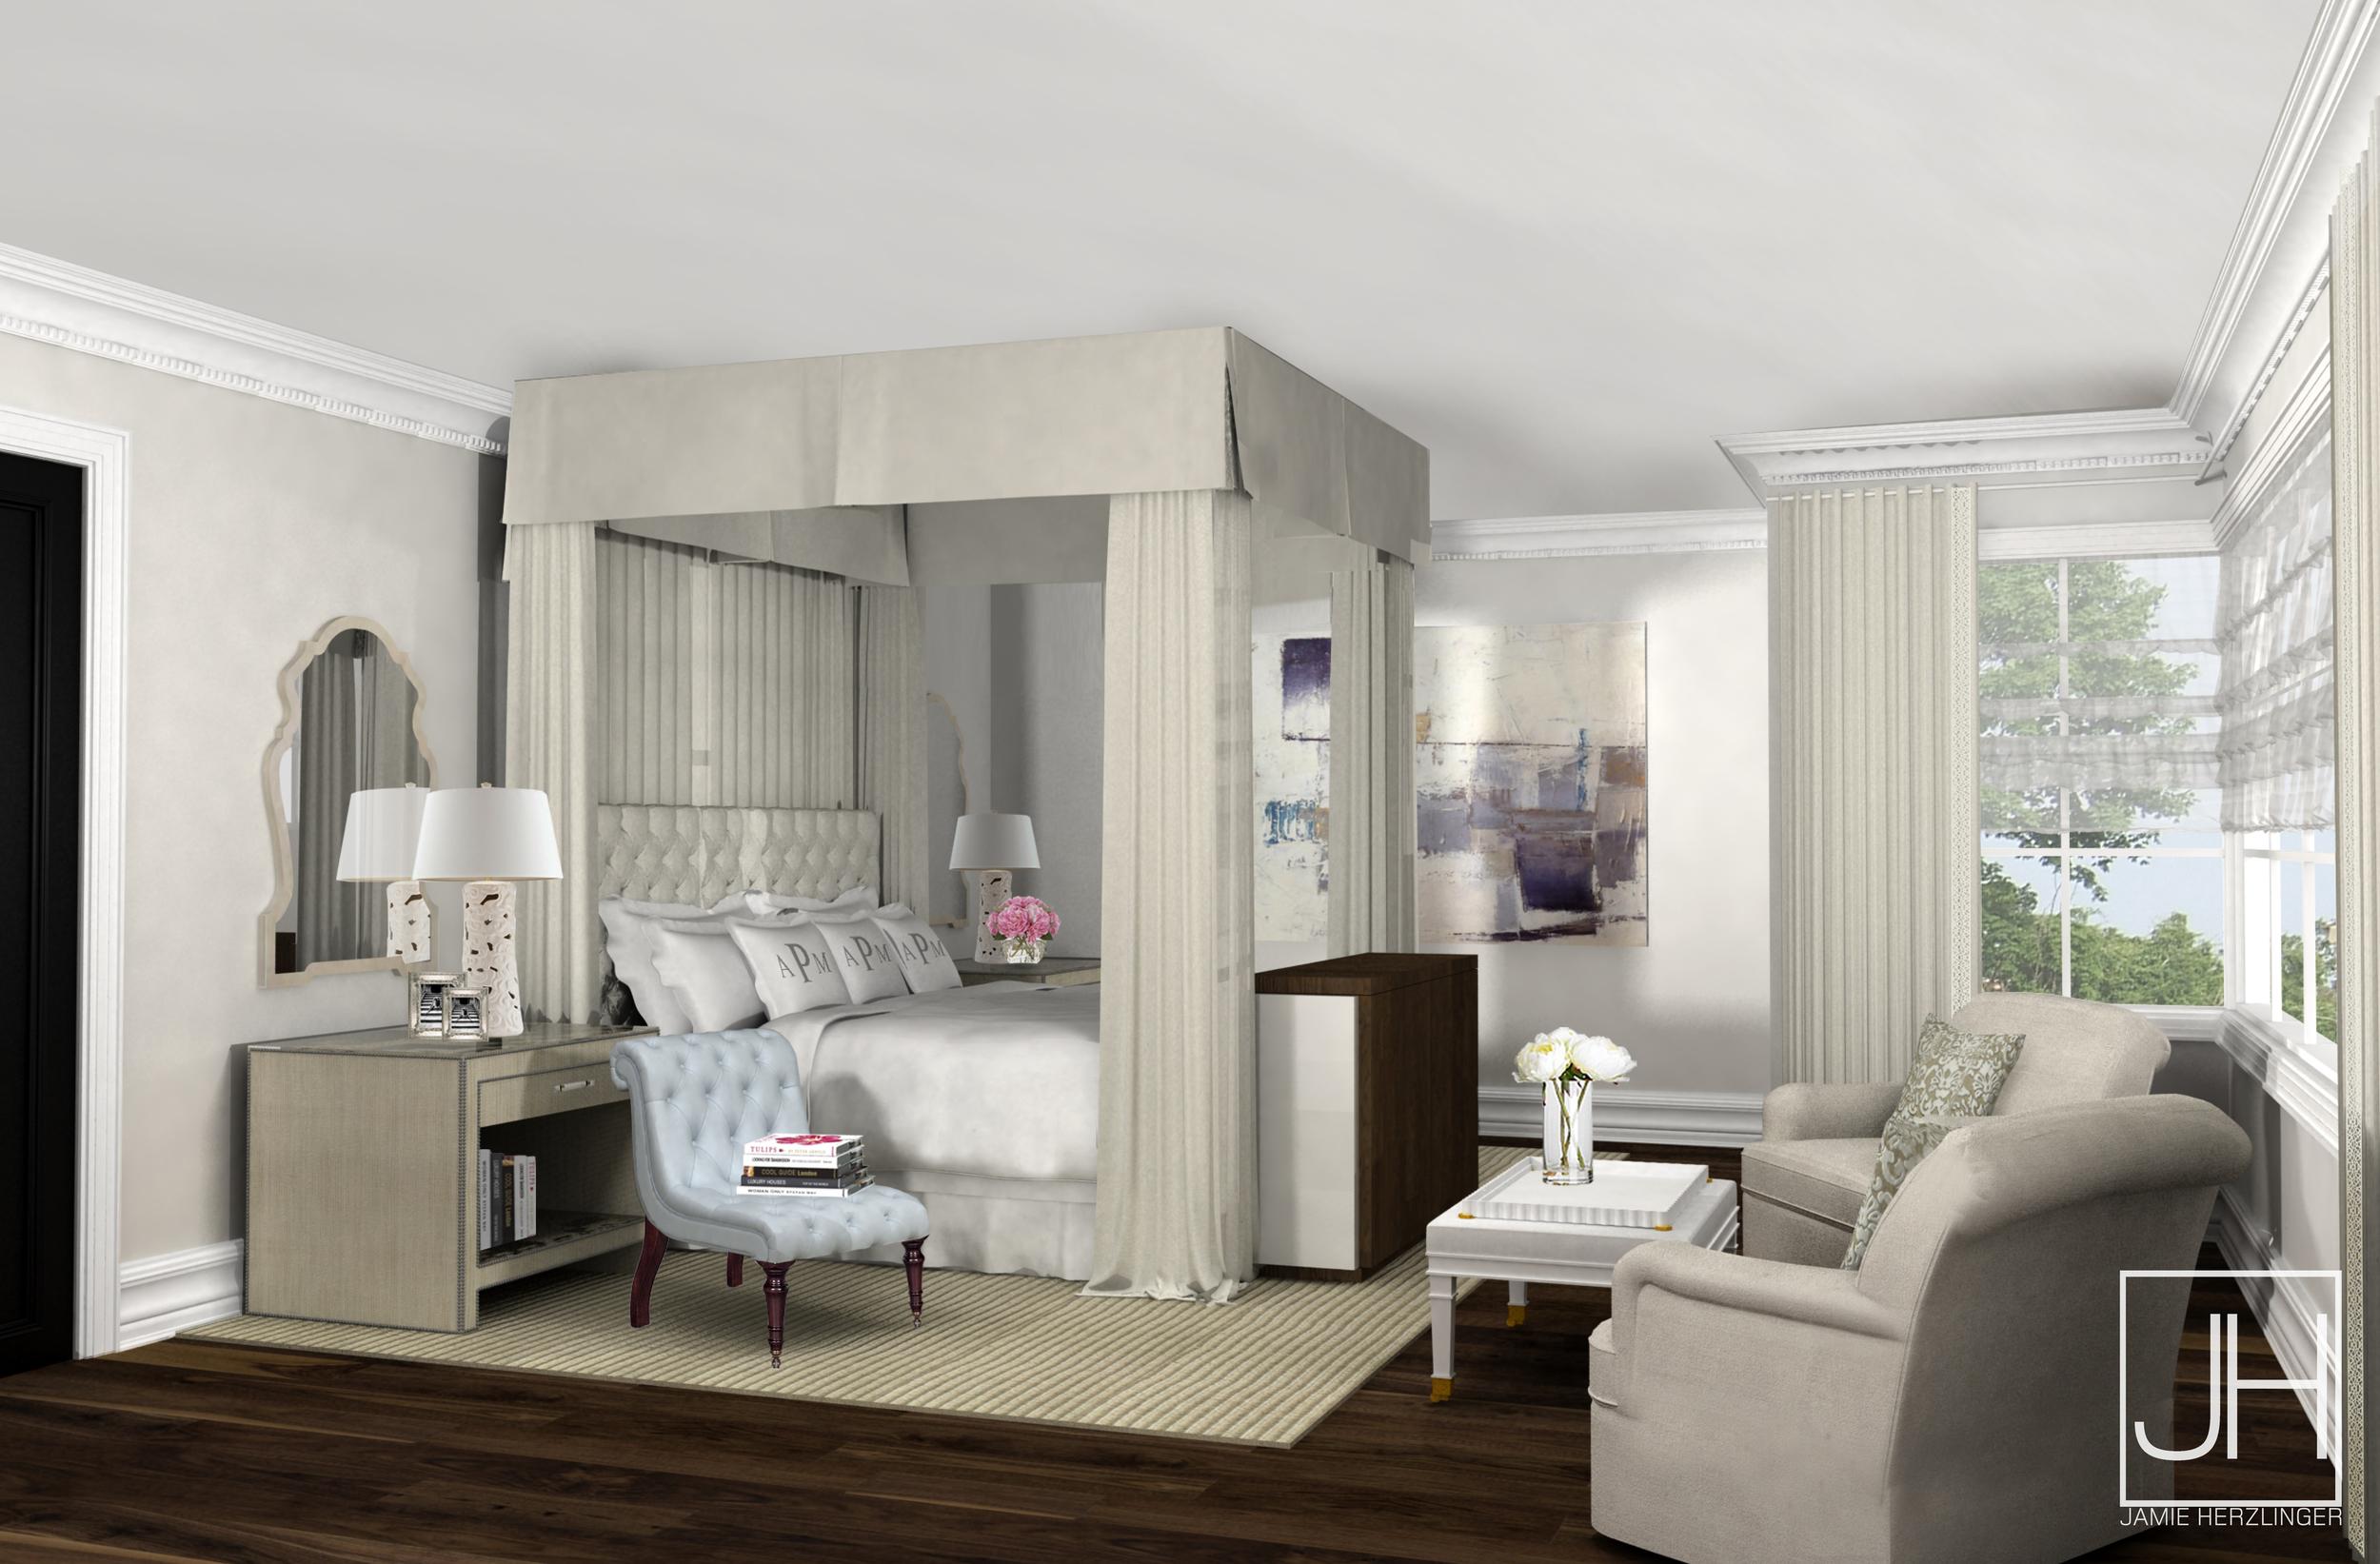 Perrin_master bedroom_040915.jpg